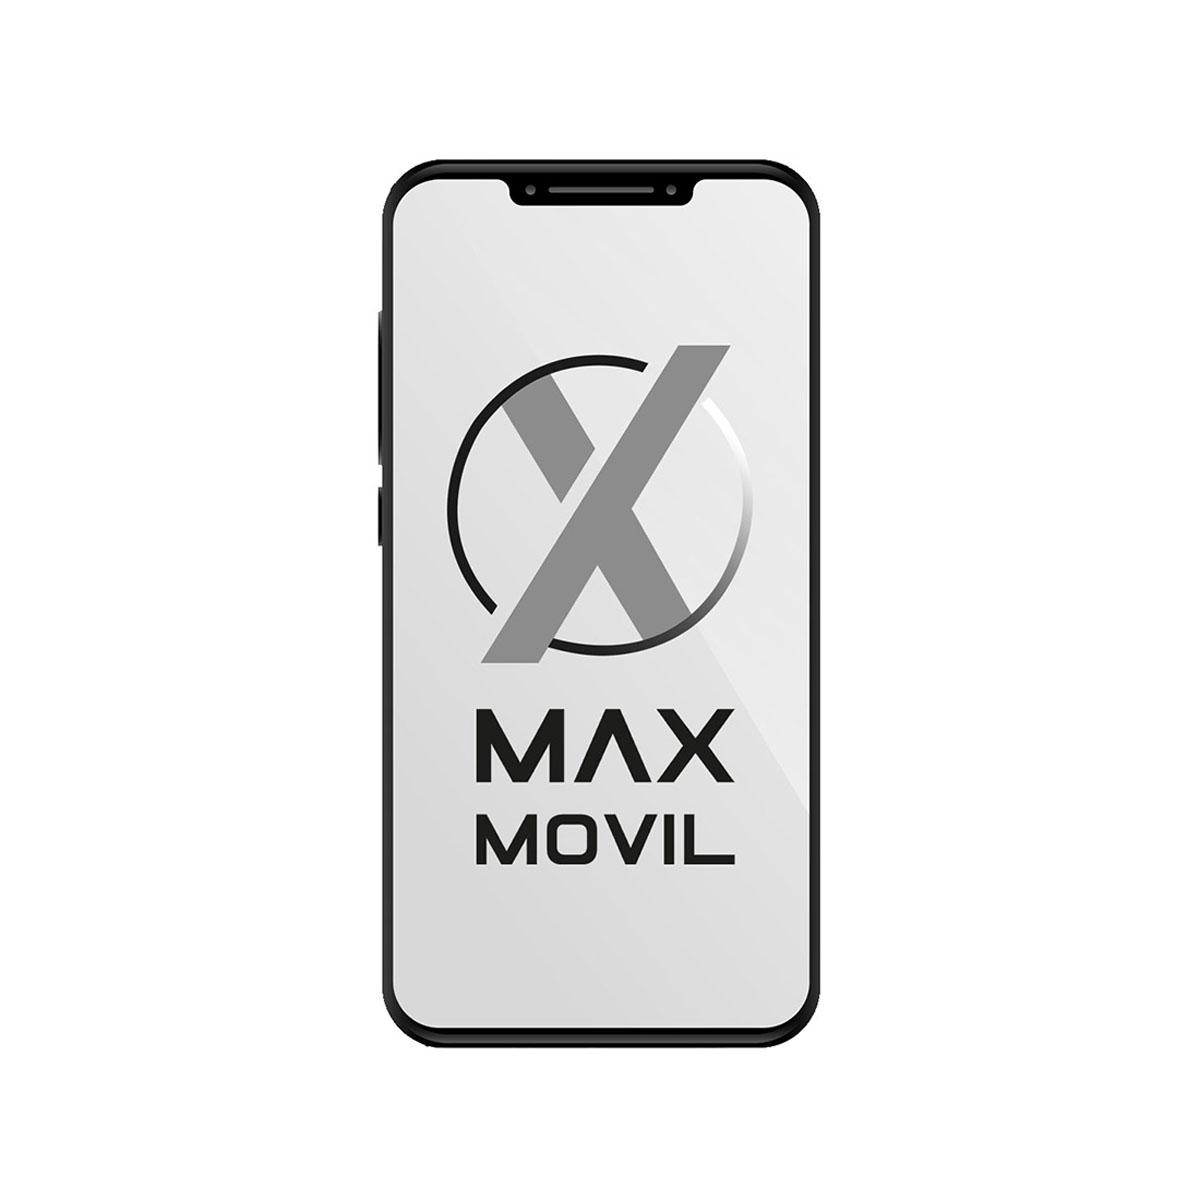 Tarjeta Memory Stick Micro M2 de 1GB